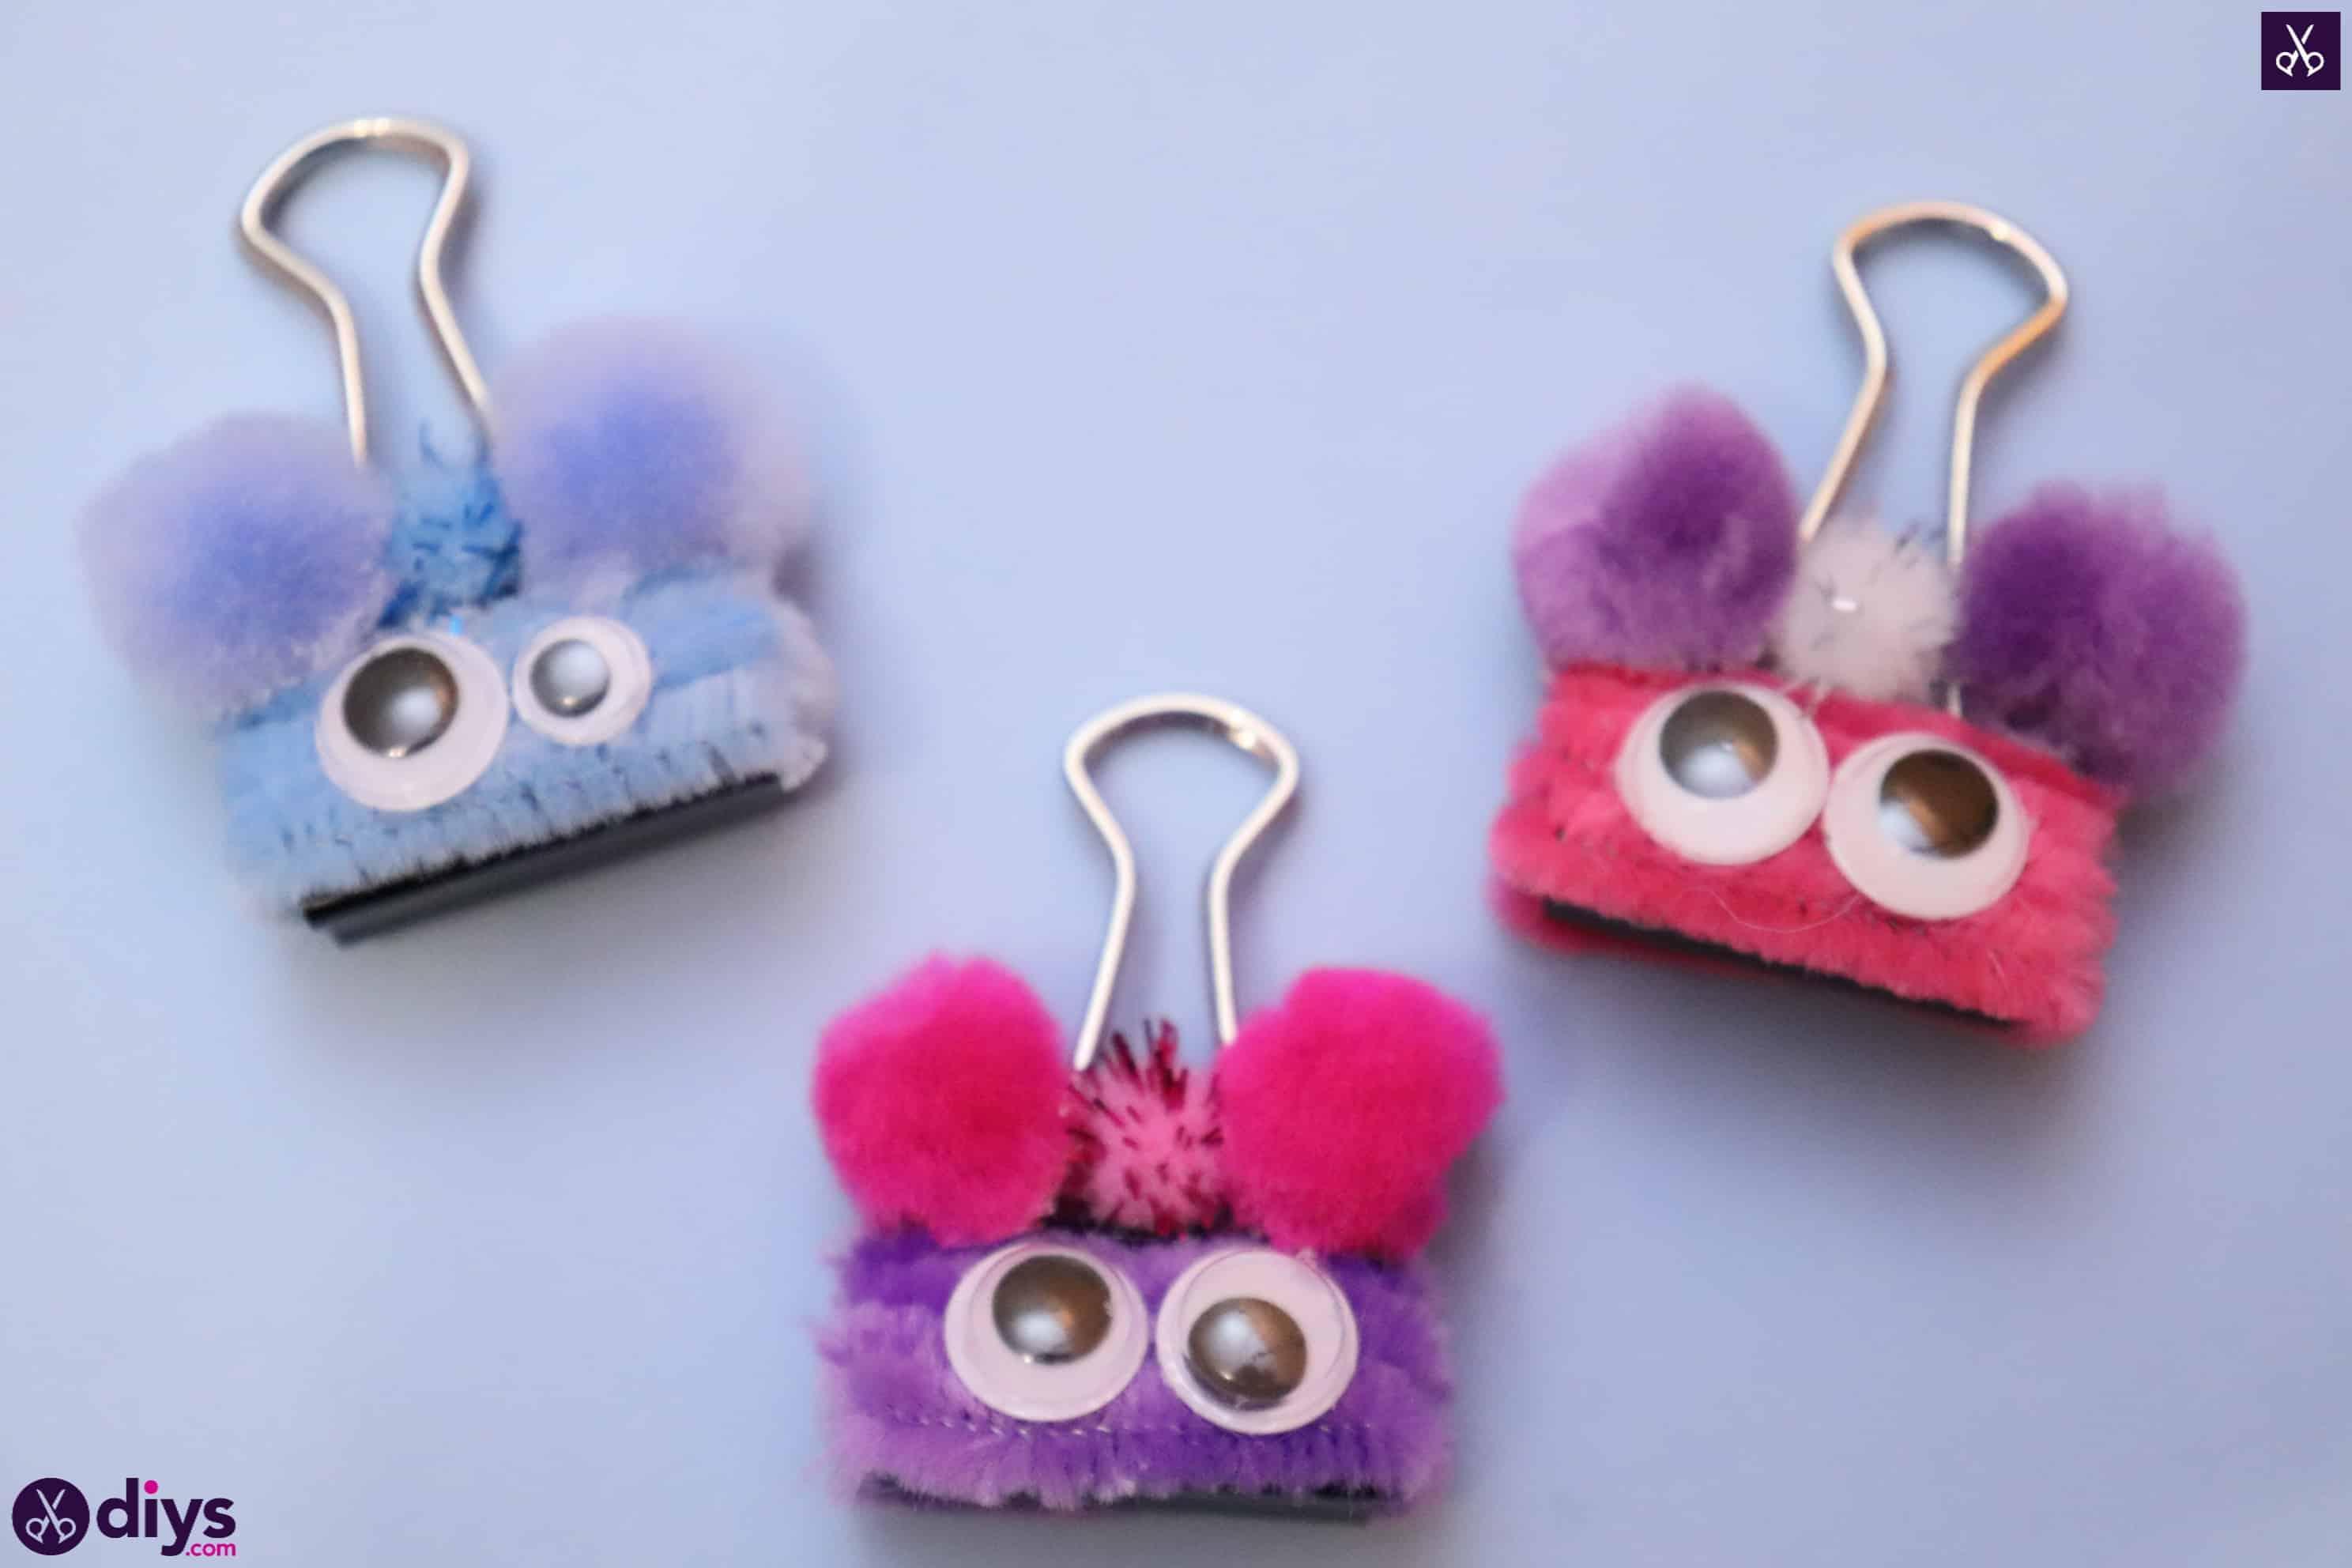 Diy binder clip card holder fun craft